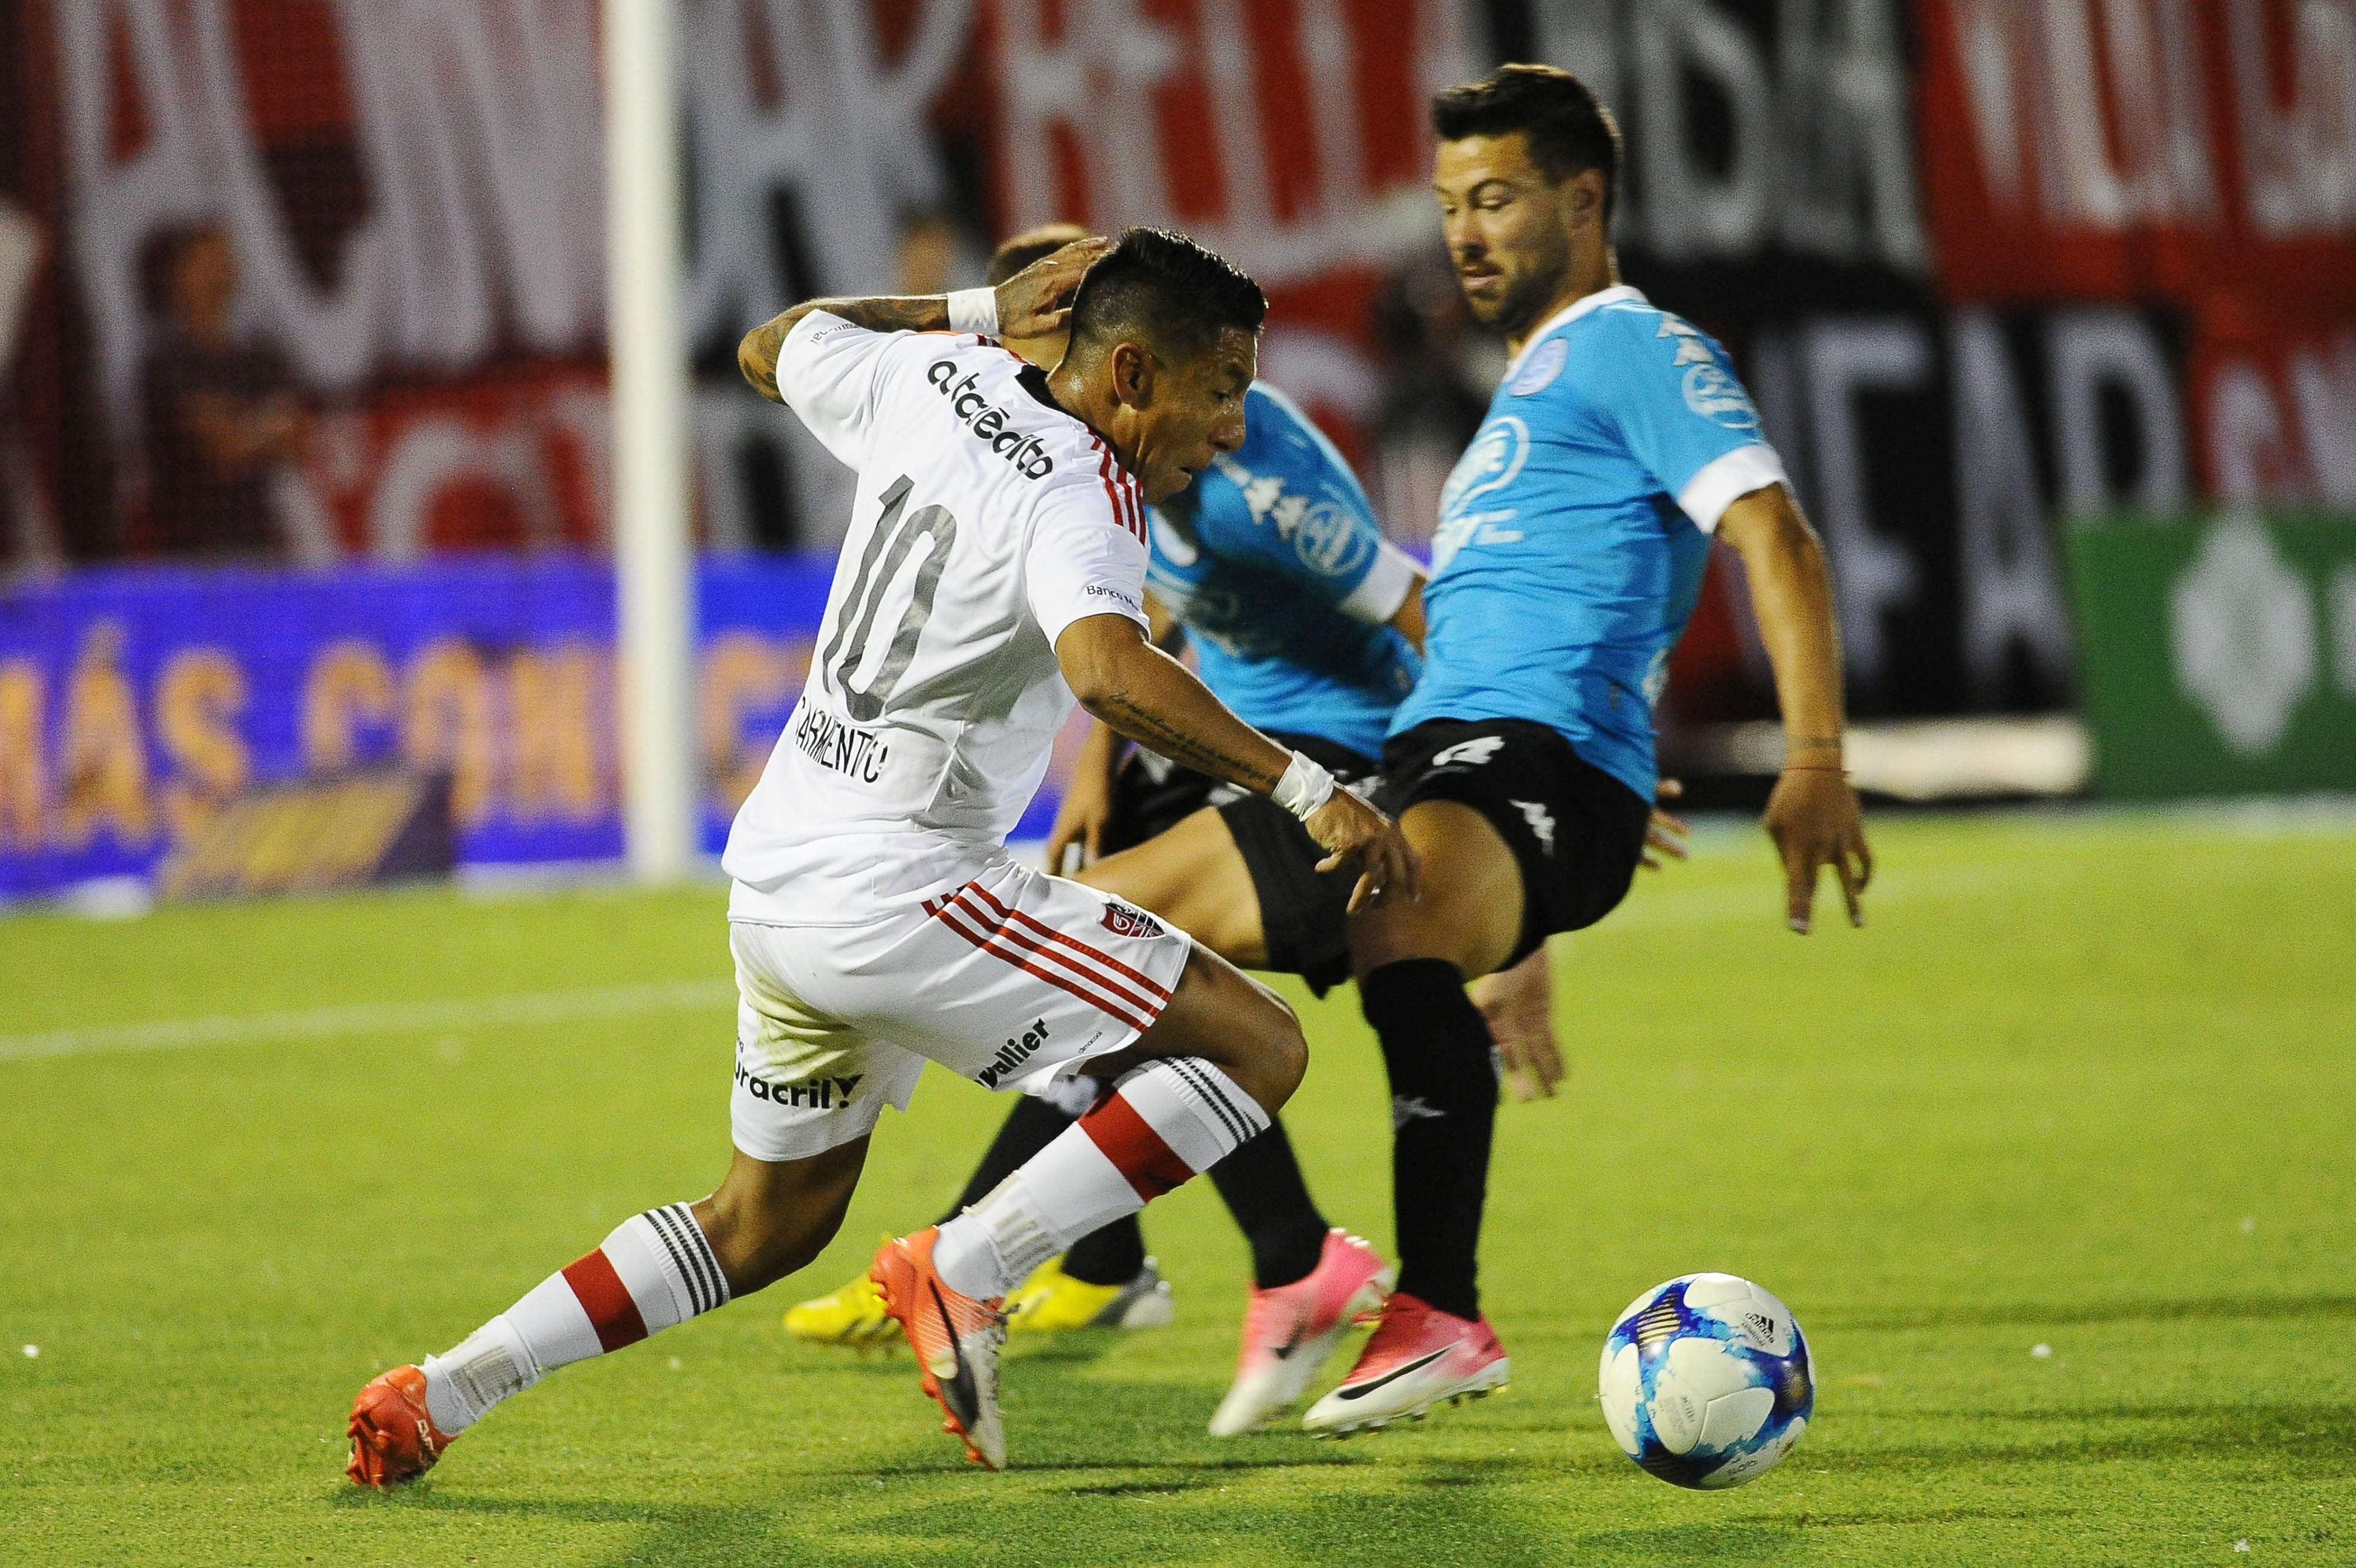 Newell'scayó de local en la Superliga (Telam)